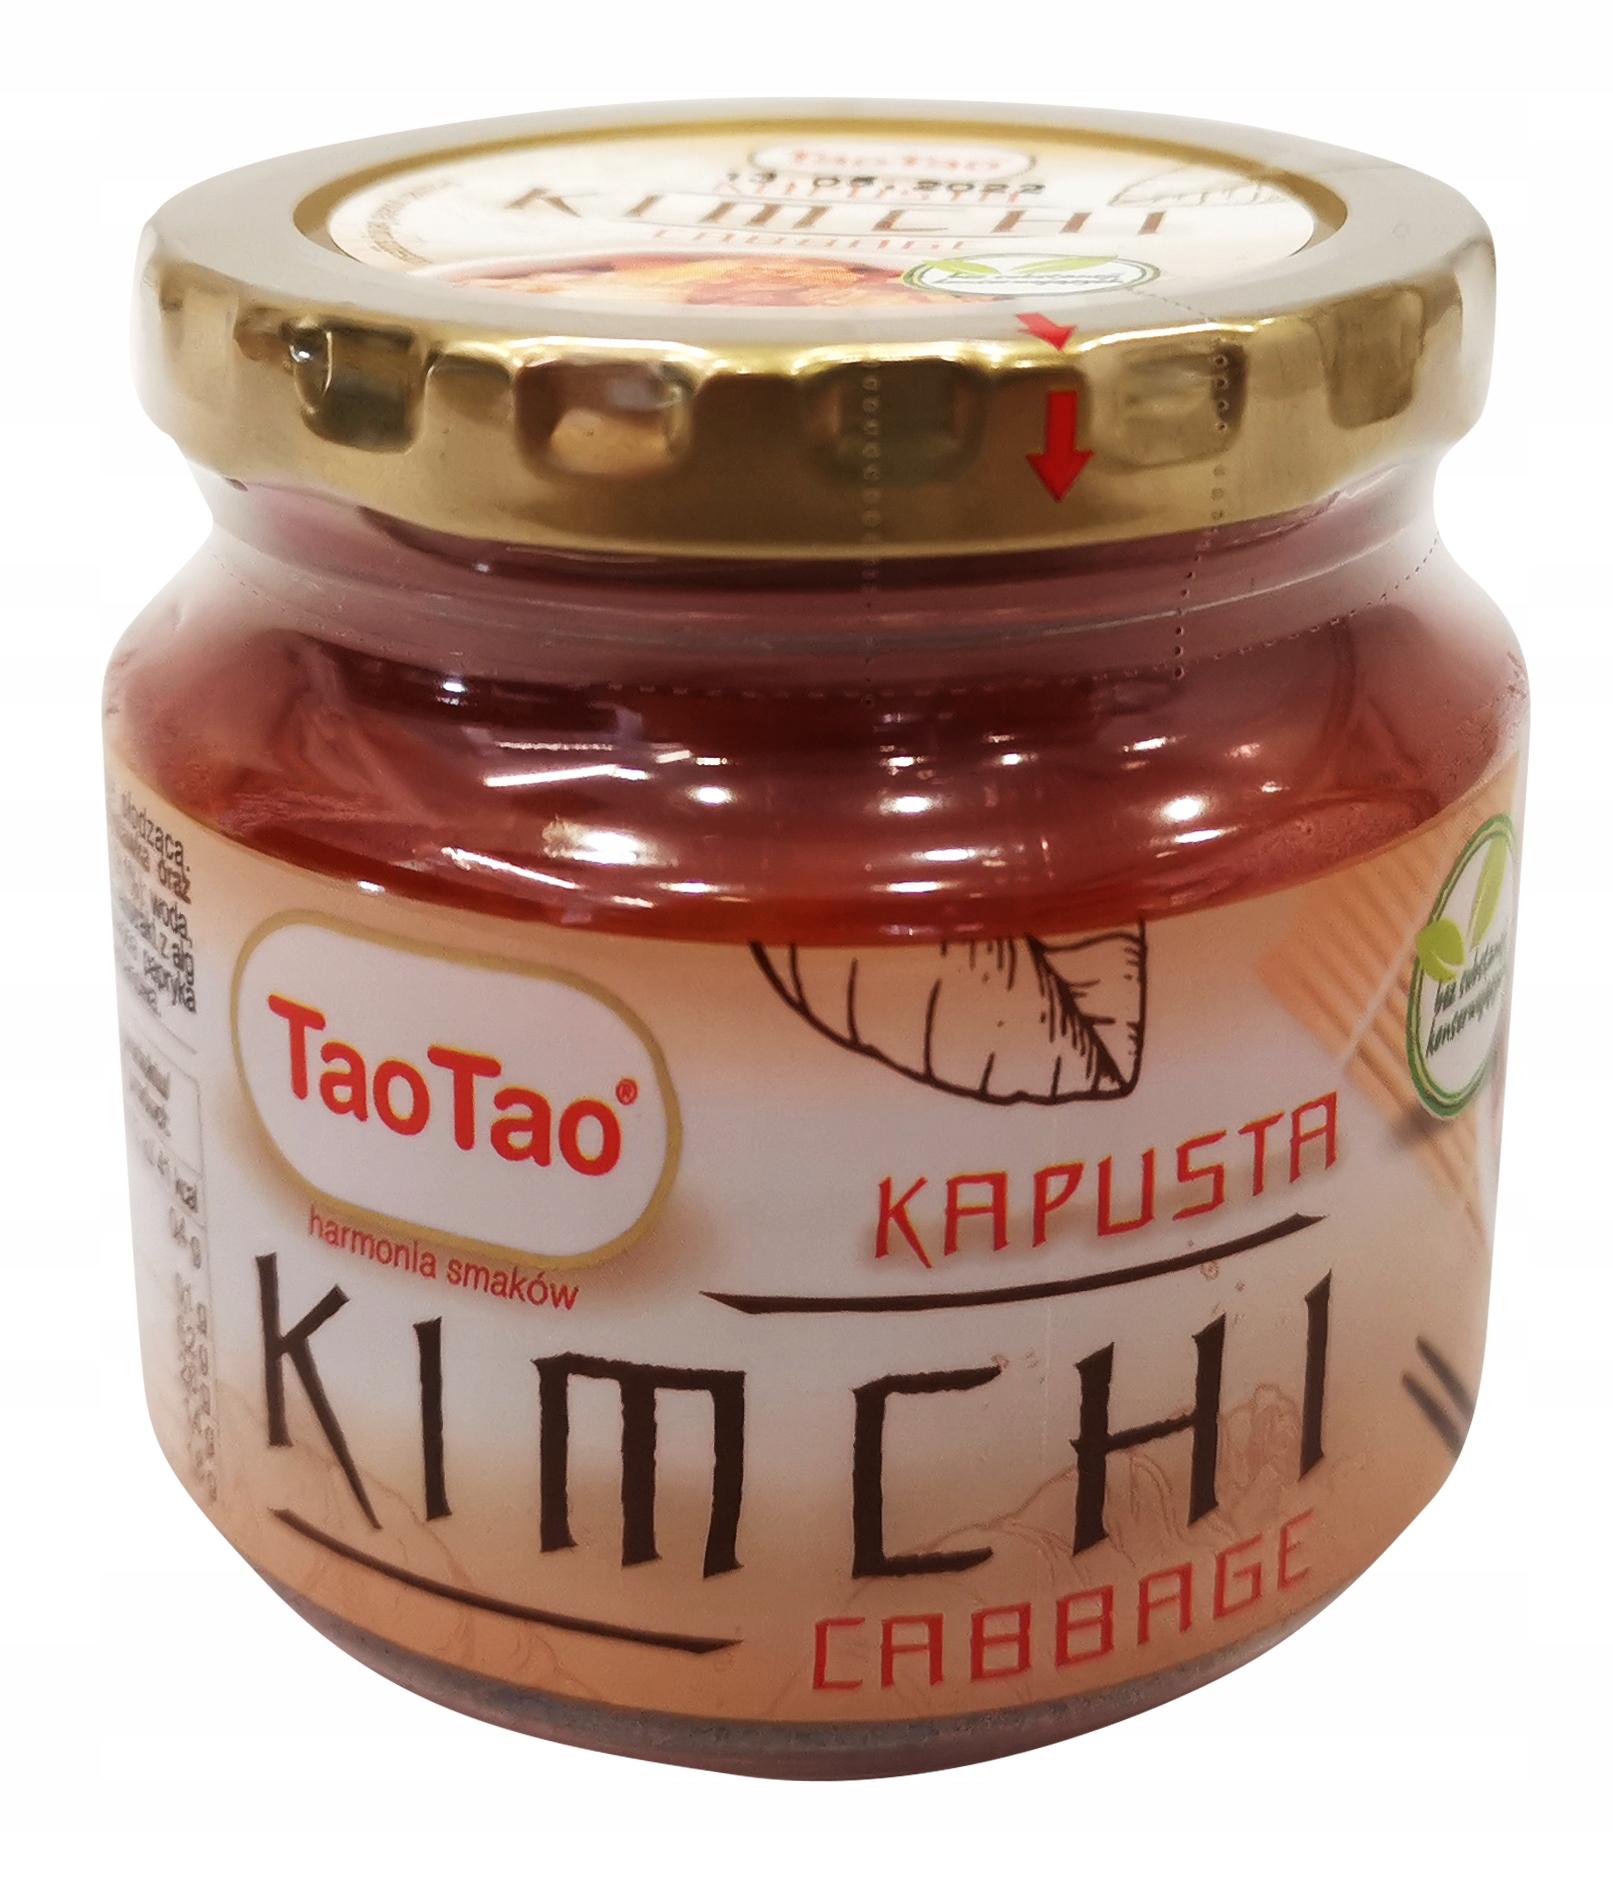 Kapusta Kimchi 215G TaoTao